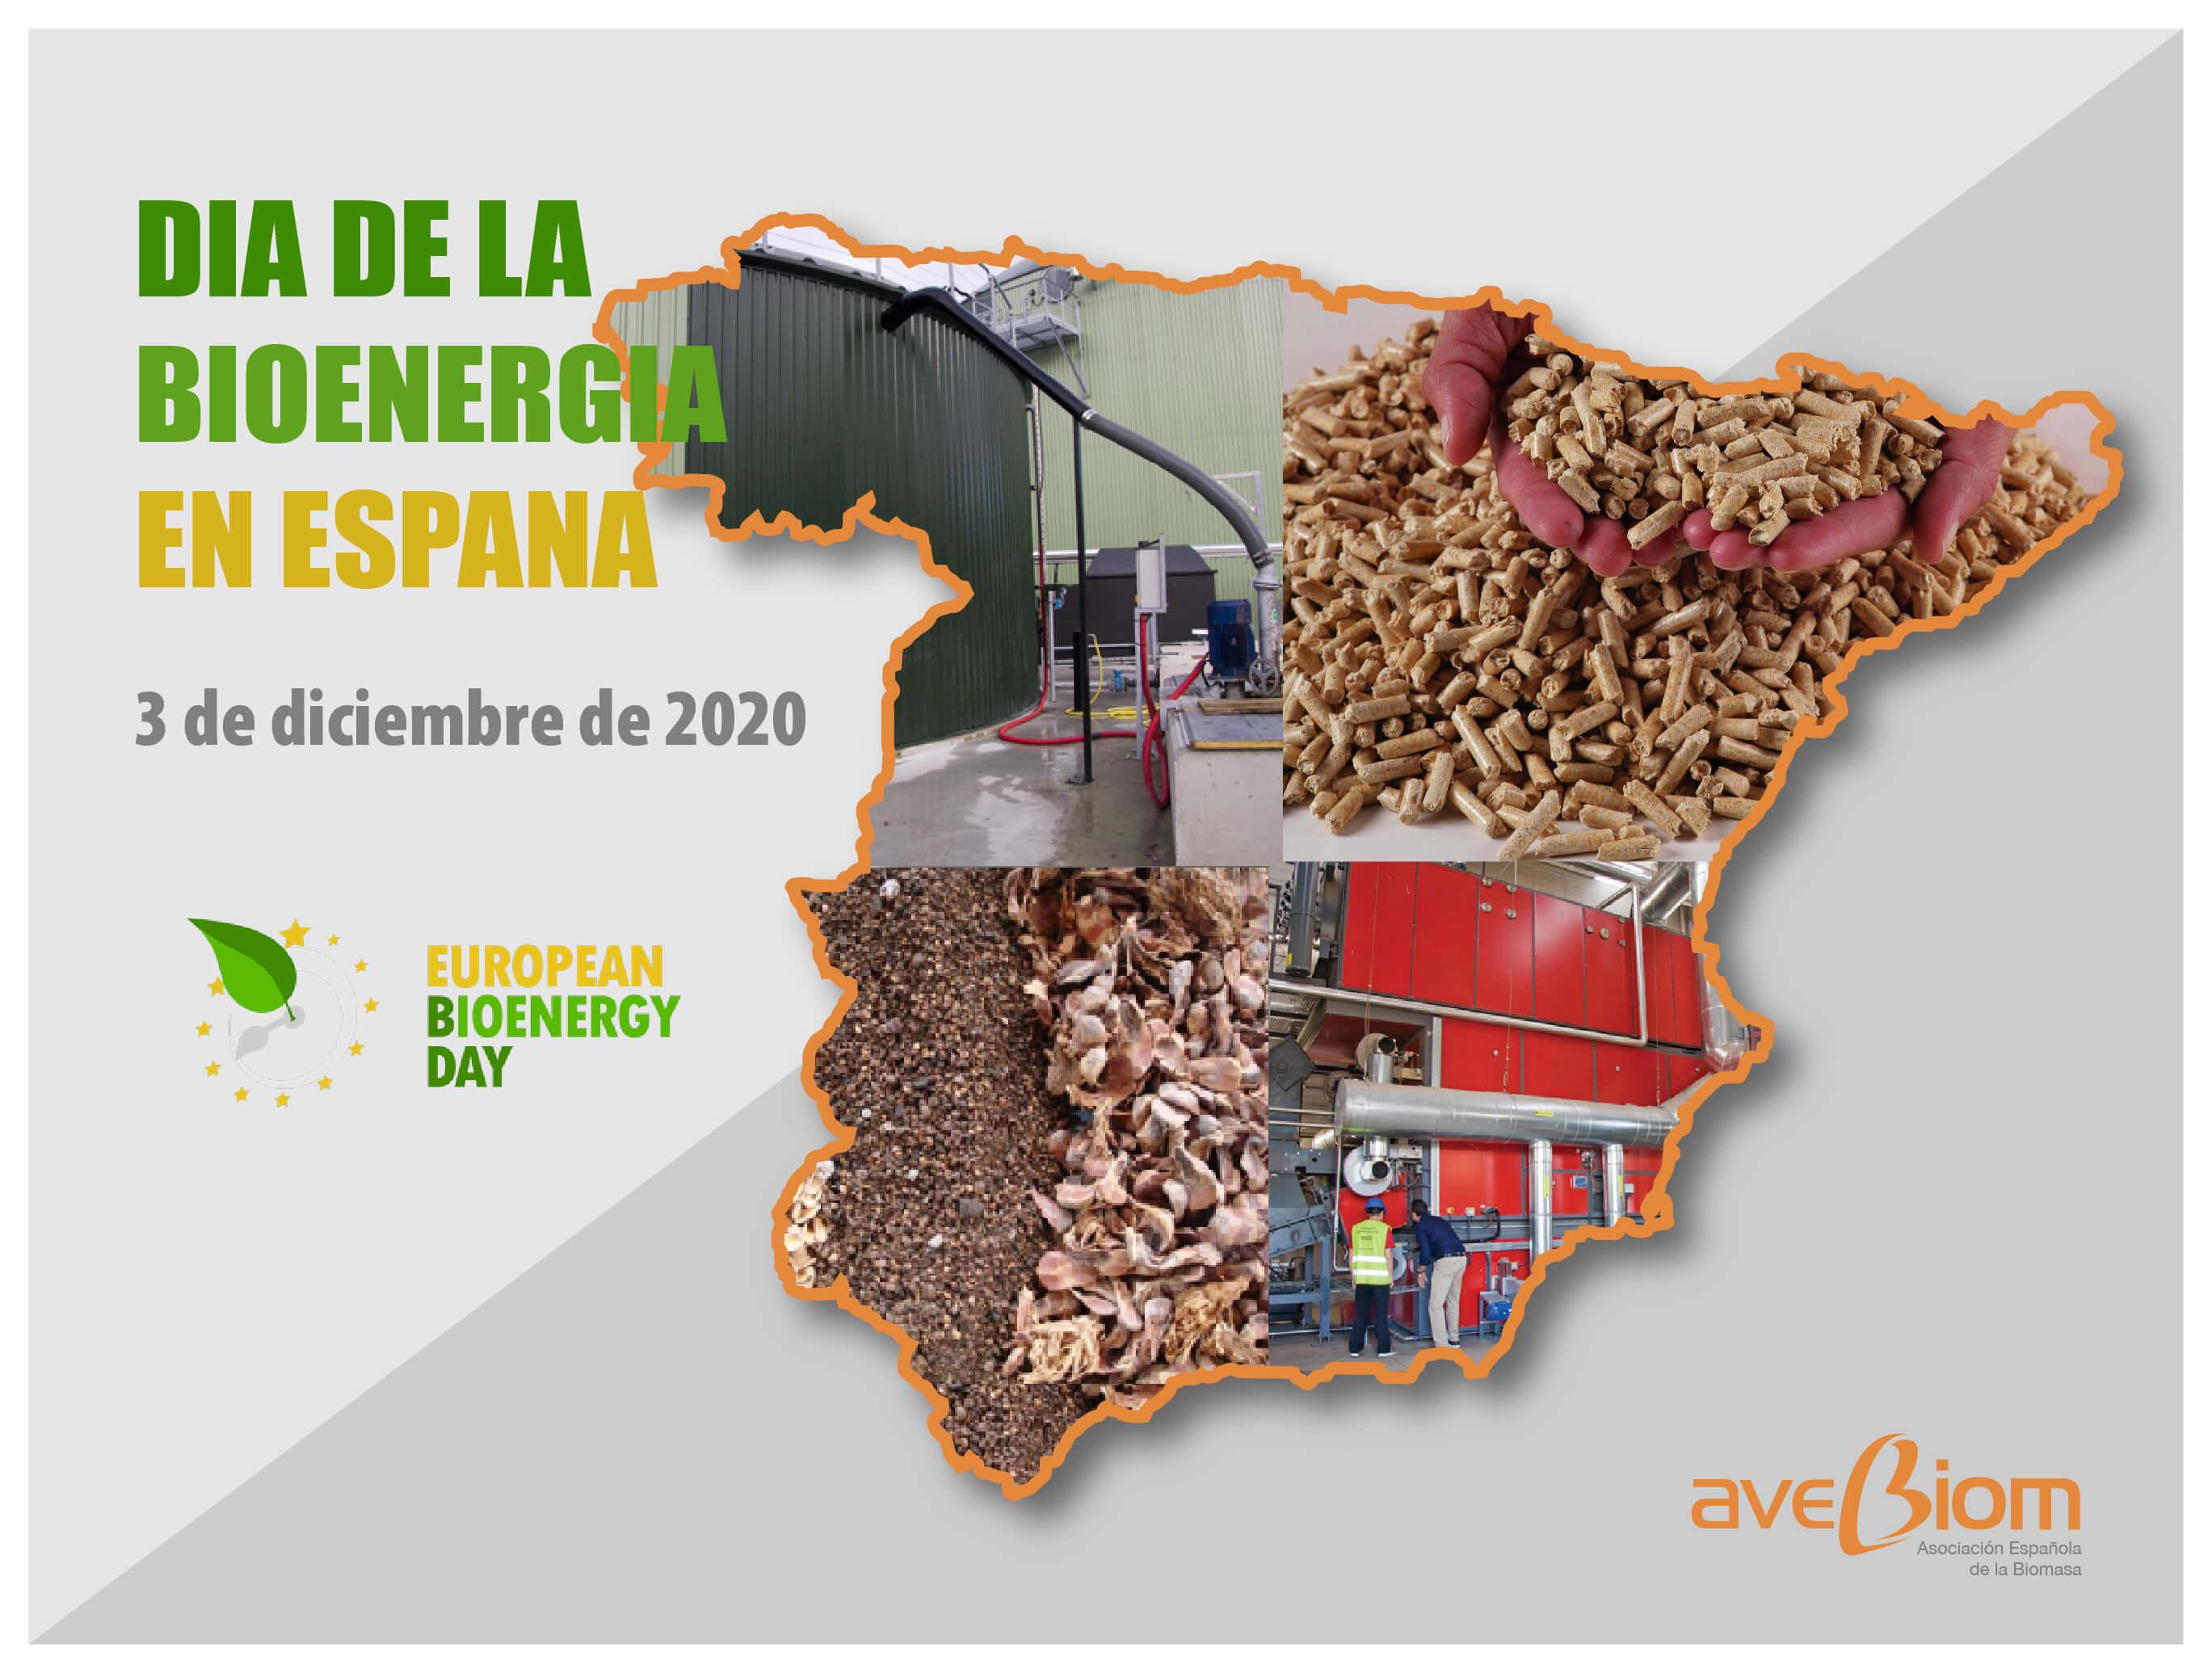 Dia da Bioenergia na Espanha